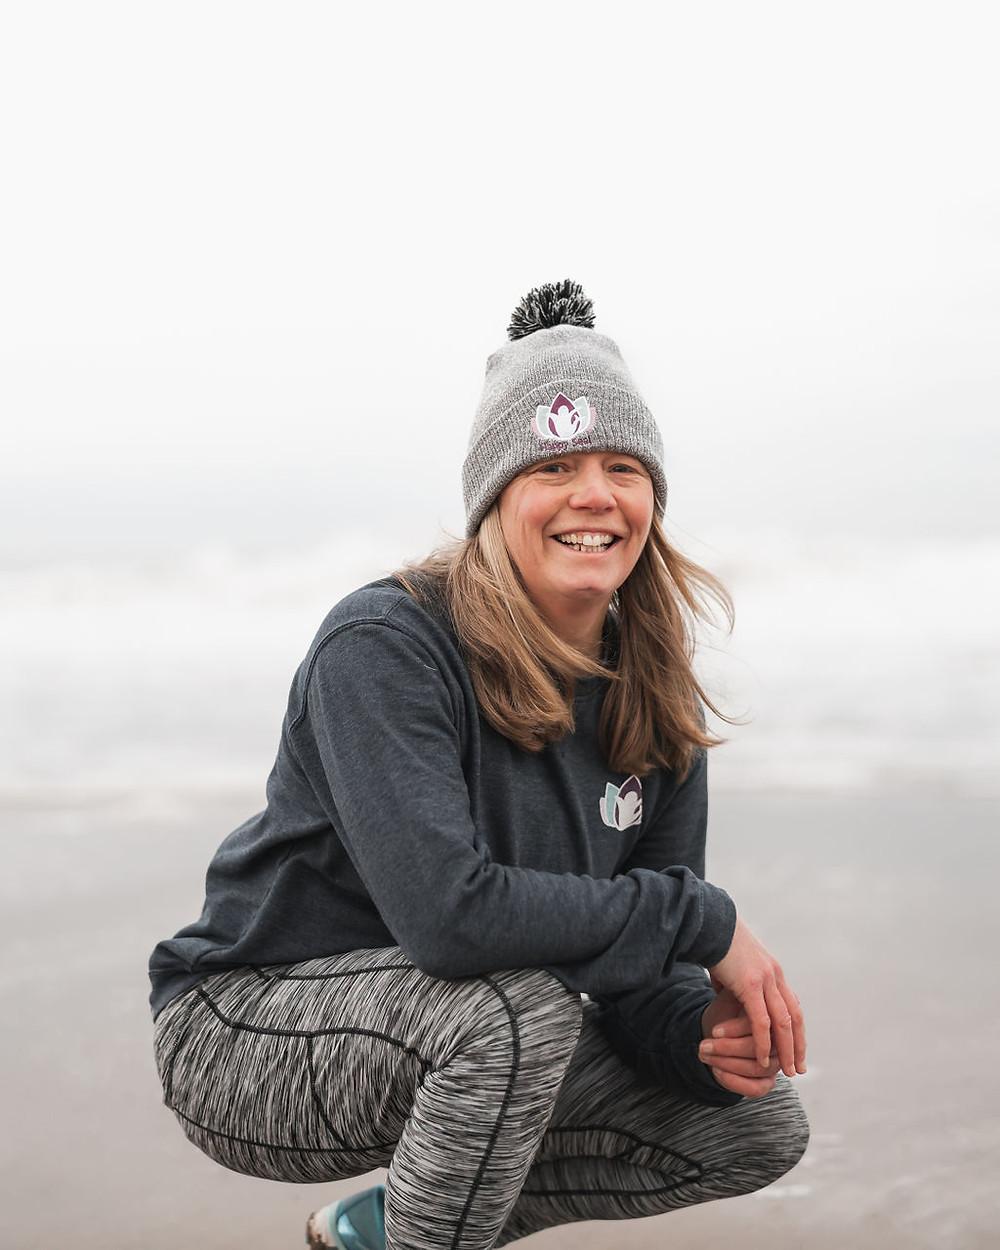 Helen Happy Seal Yoga Teacher in grey Happy Seal Yoga beanie, blue happy seal yoga sweatshirt and grey sugar pocket leggings